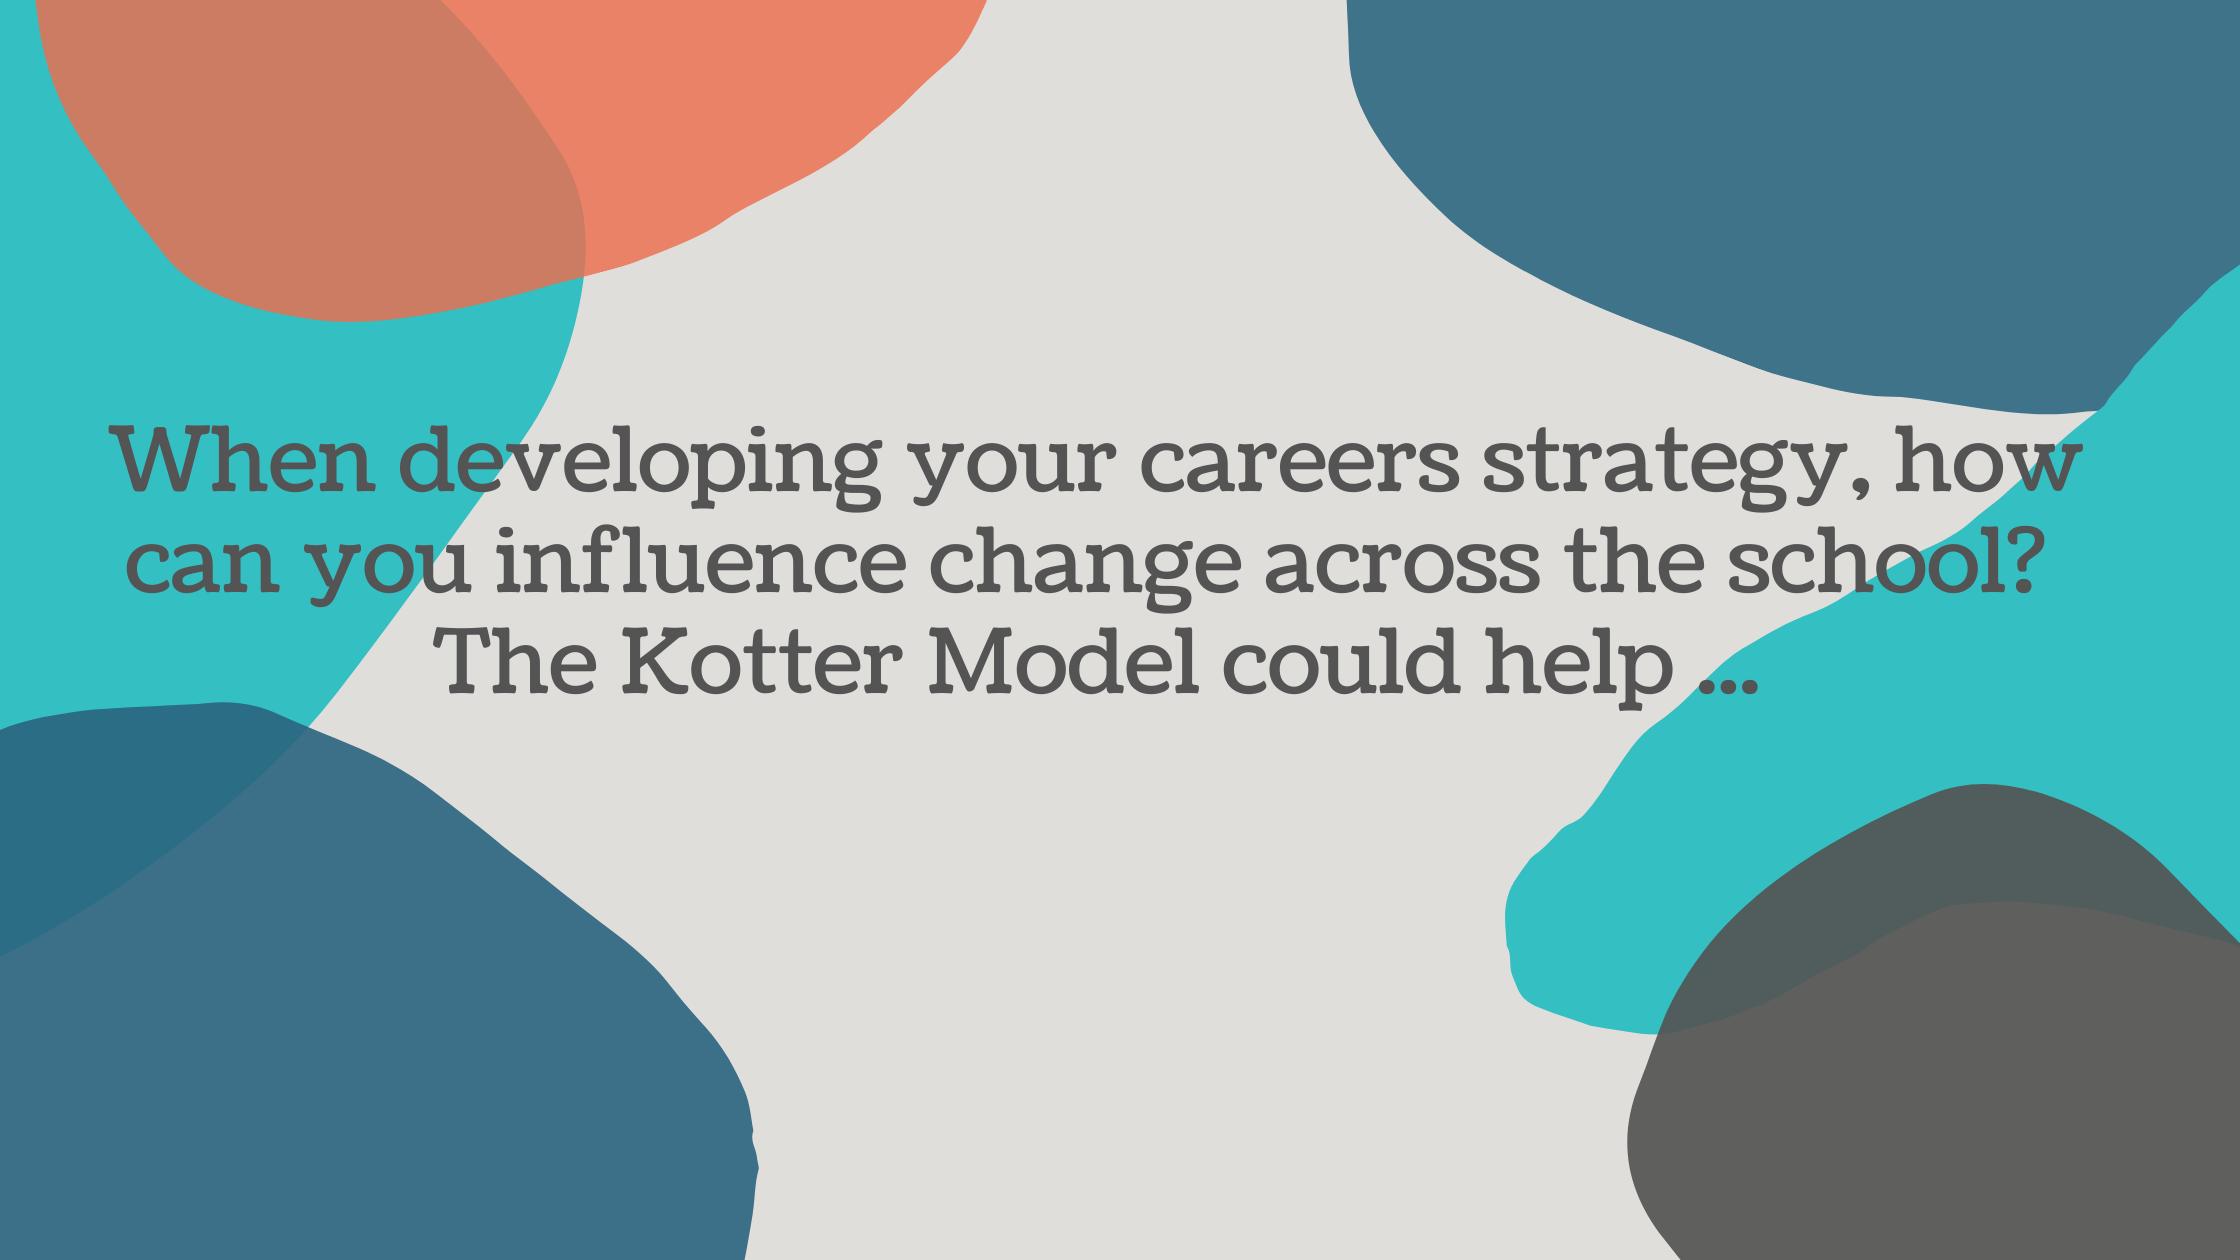 Kotter Model image